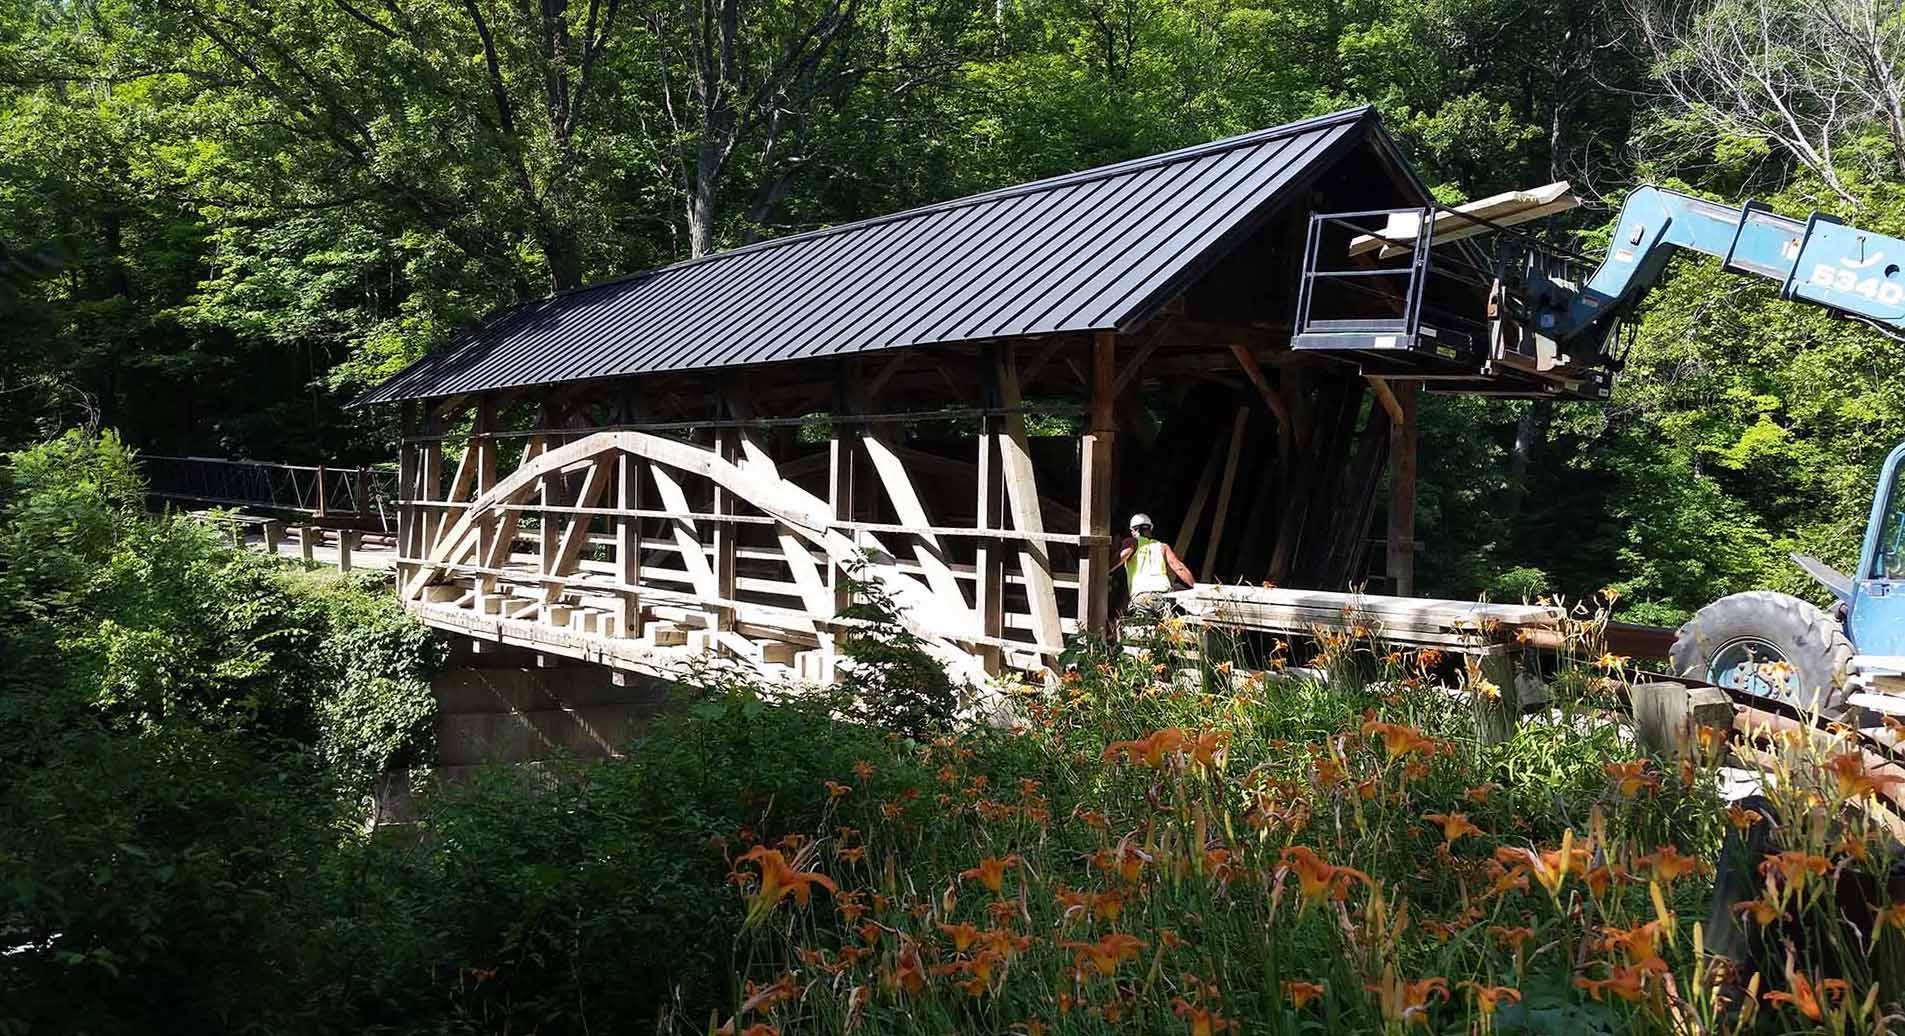 Covered Bridge Construction